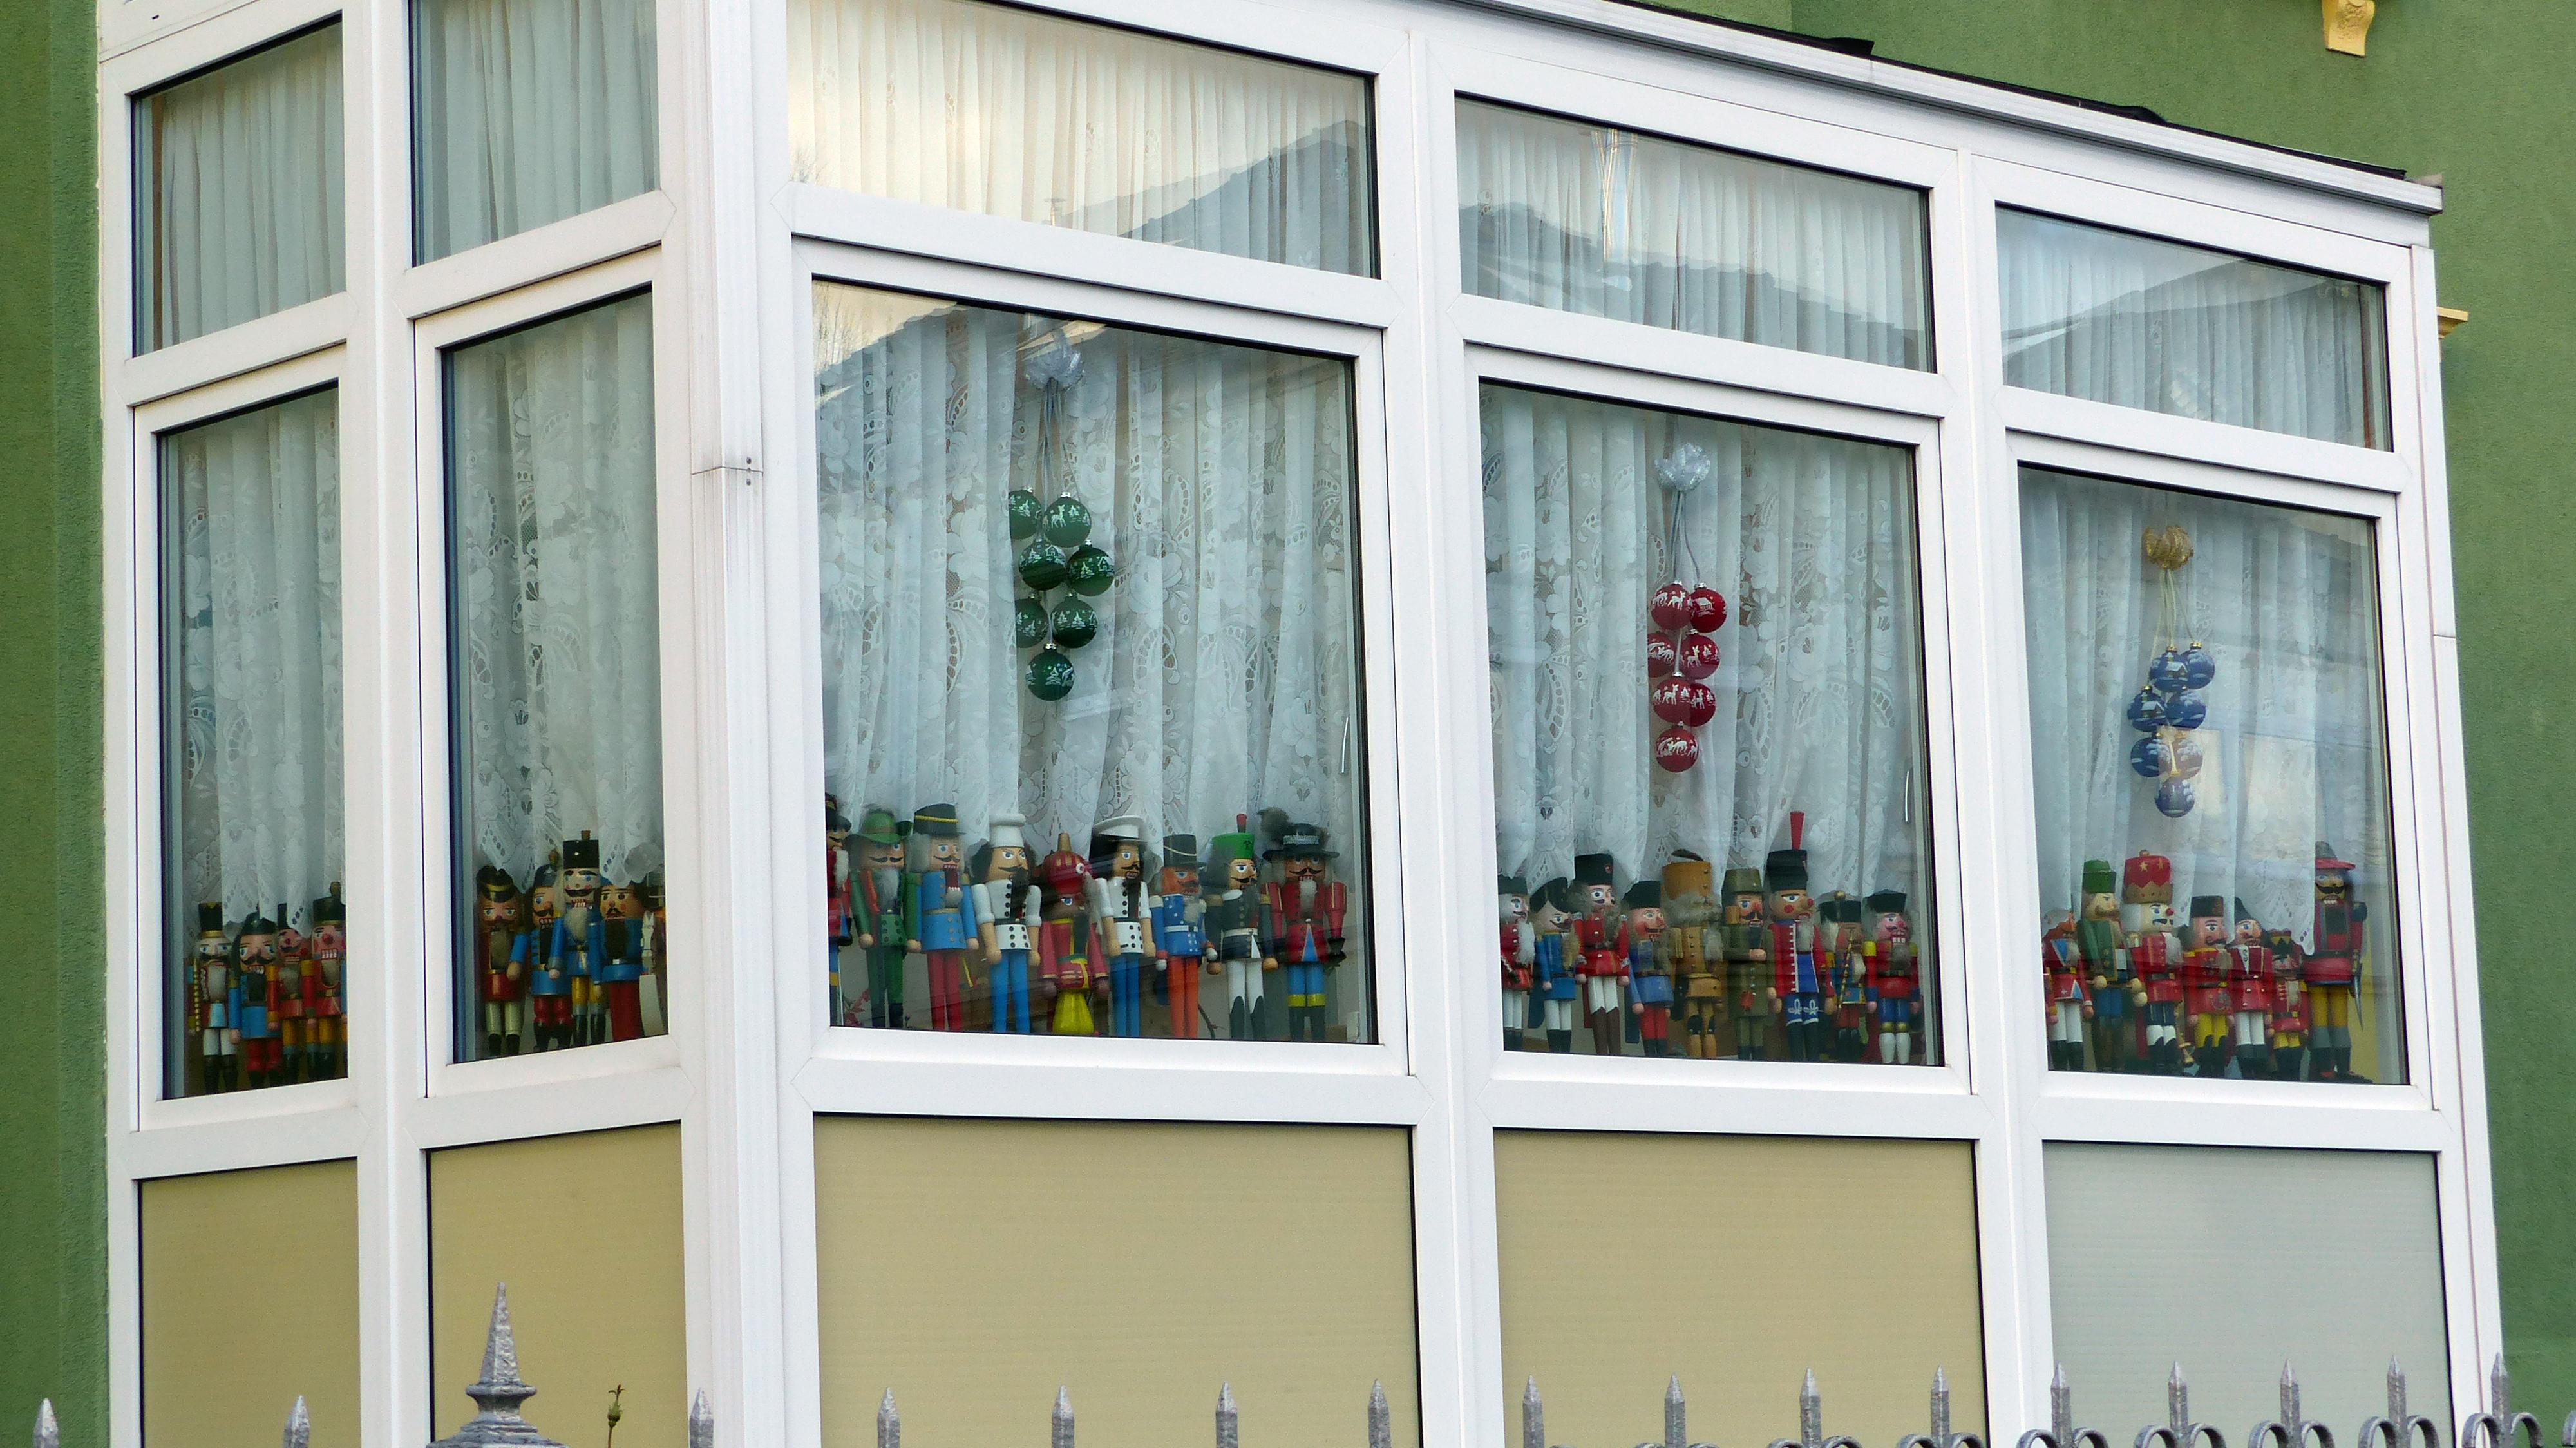 Balancoire Veranda Jardin: Balançoire pour le jardin ou lа terasse ...